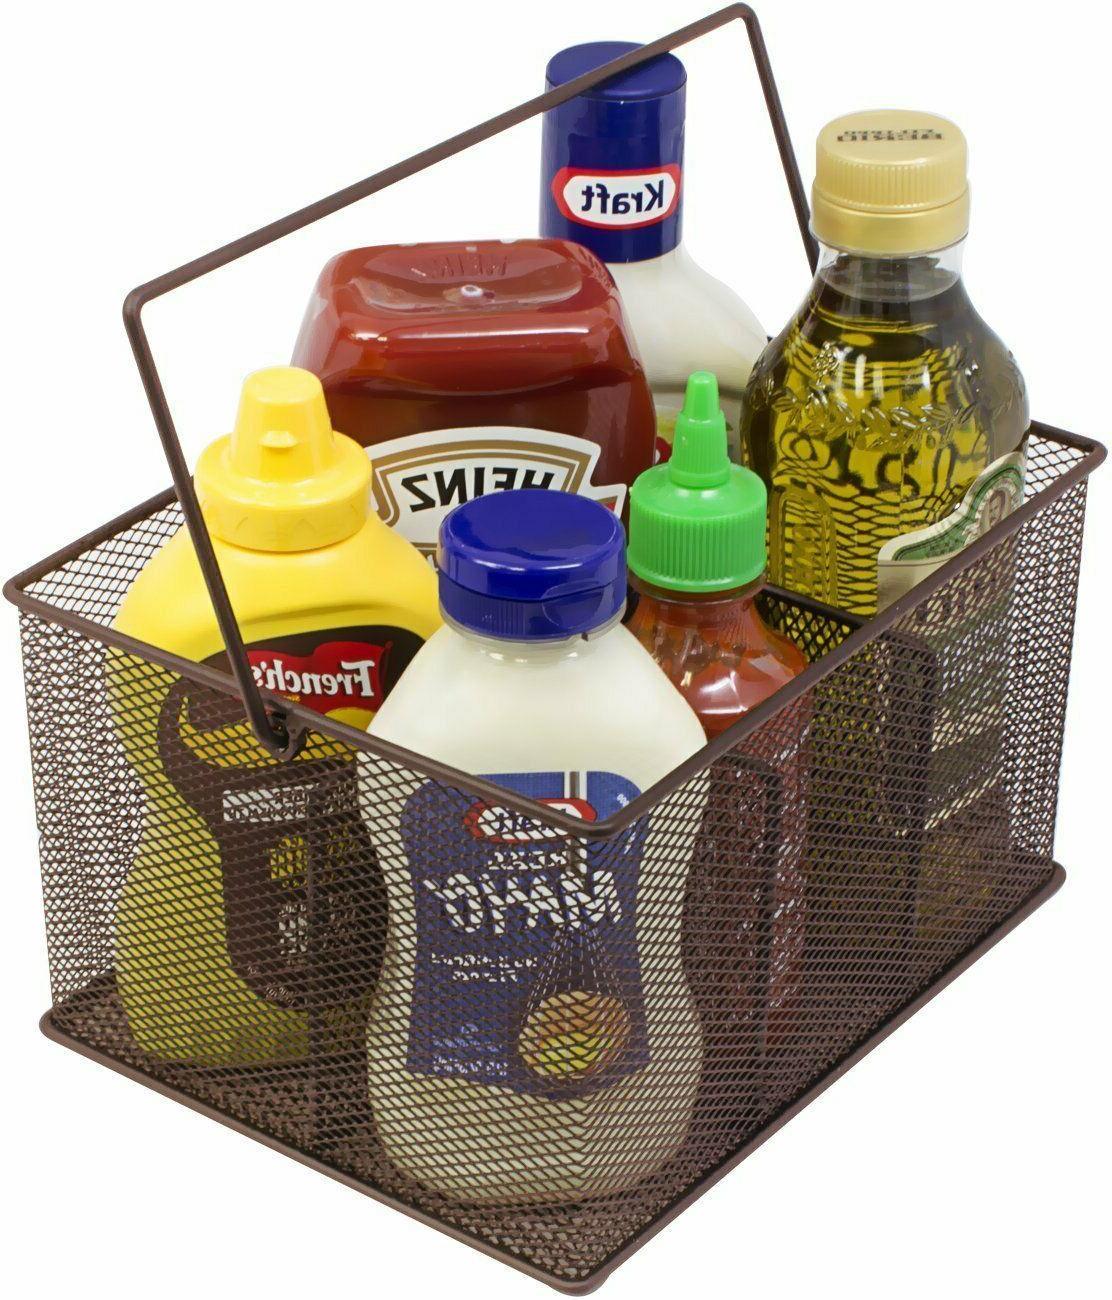 Sorbus — Silverware, Napkin Holder, Condiment